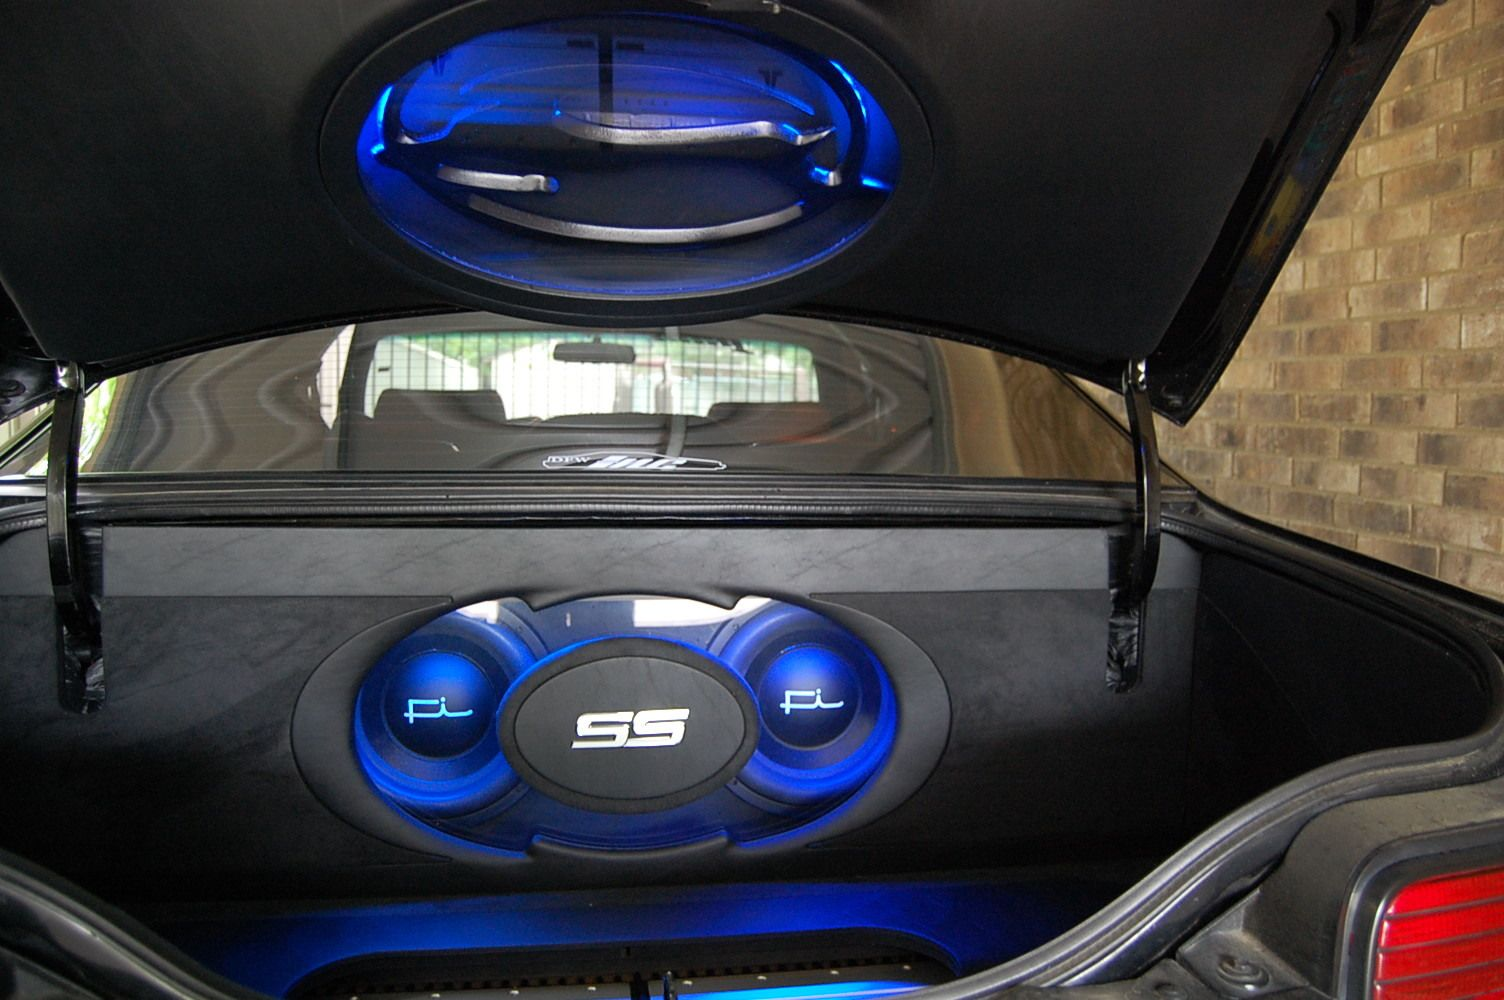 105 Best Car Audio Trunk Ideas images | Car audio, Car ... |Stormtrooper Car Audio Custom Trunk Install